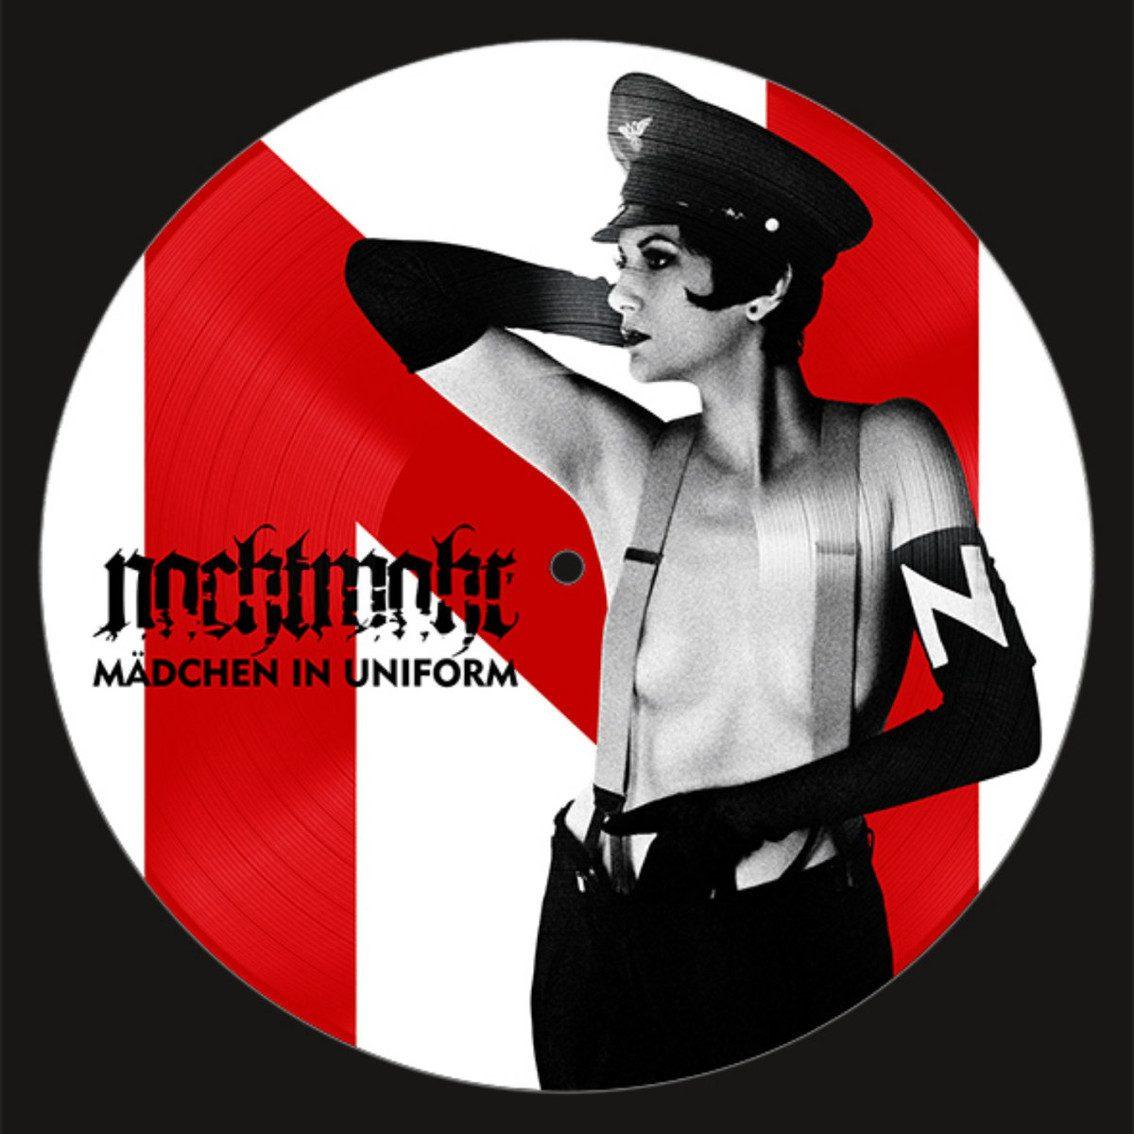 Nachtmahr sees cult mini-album 'Mädchen in Uniform' re-released as a picture vinyl - only 500 copies!